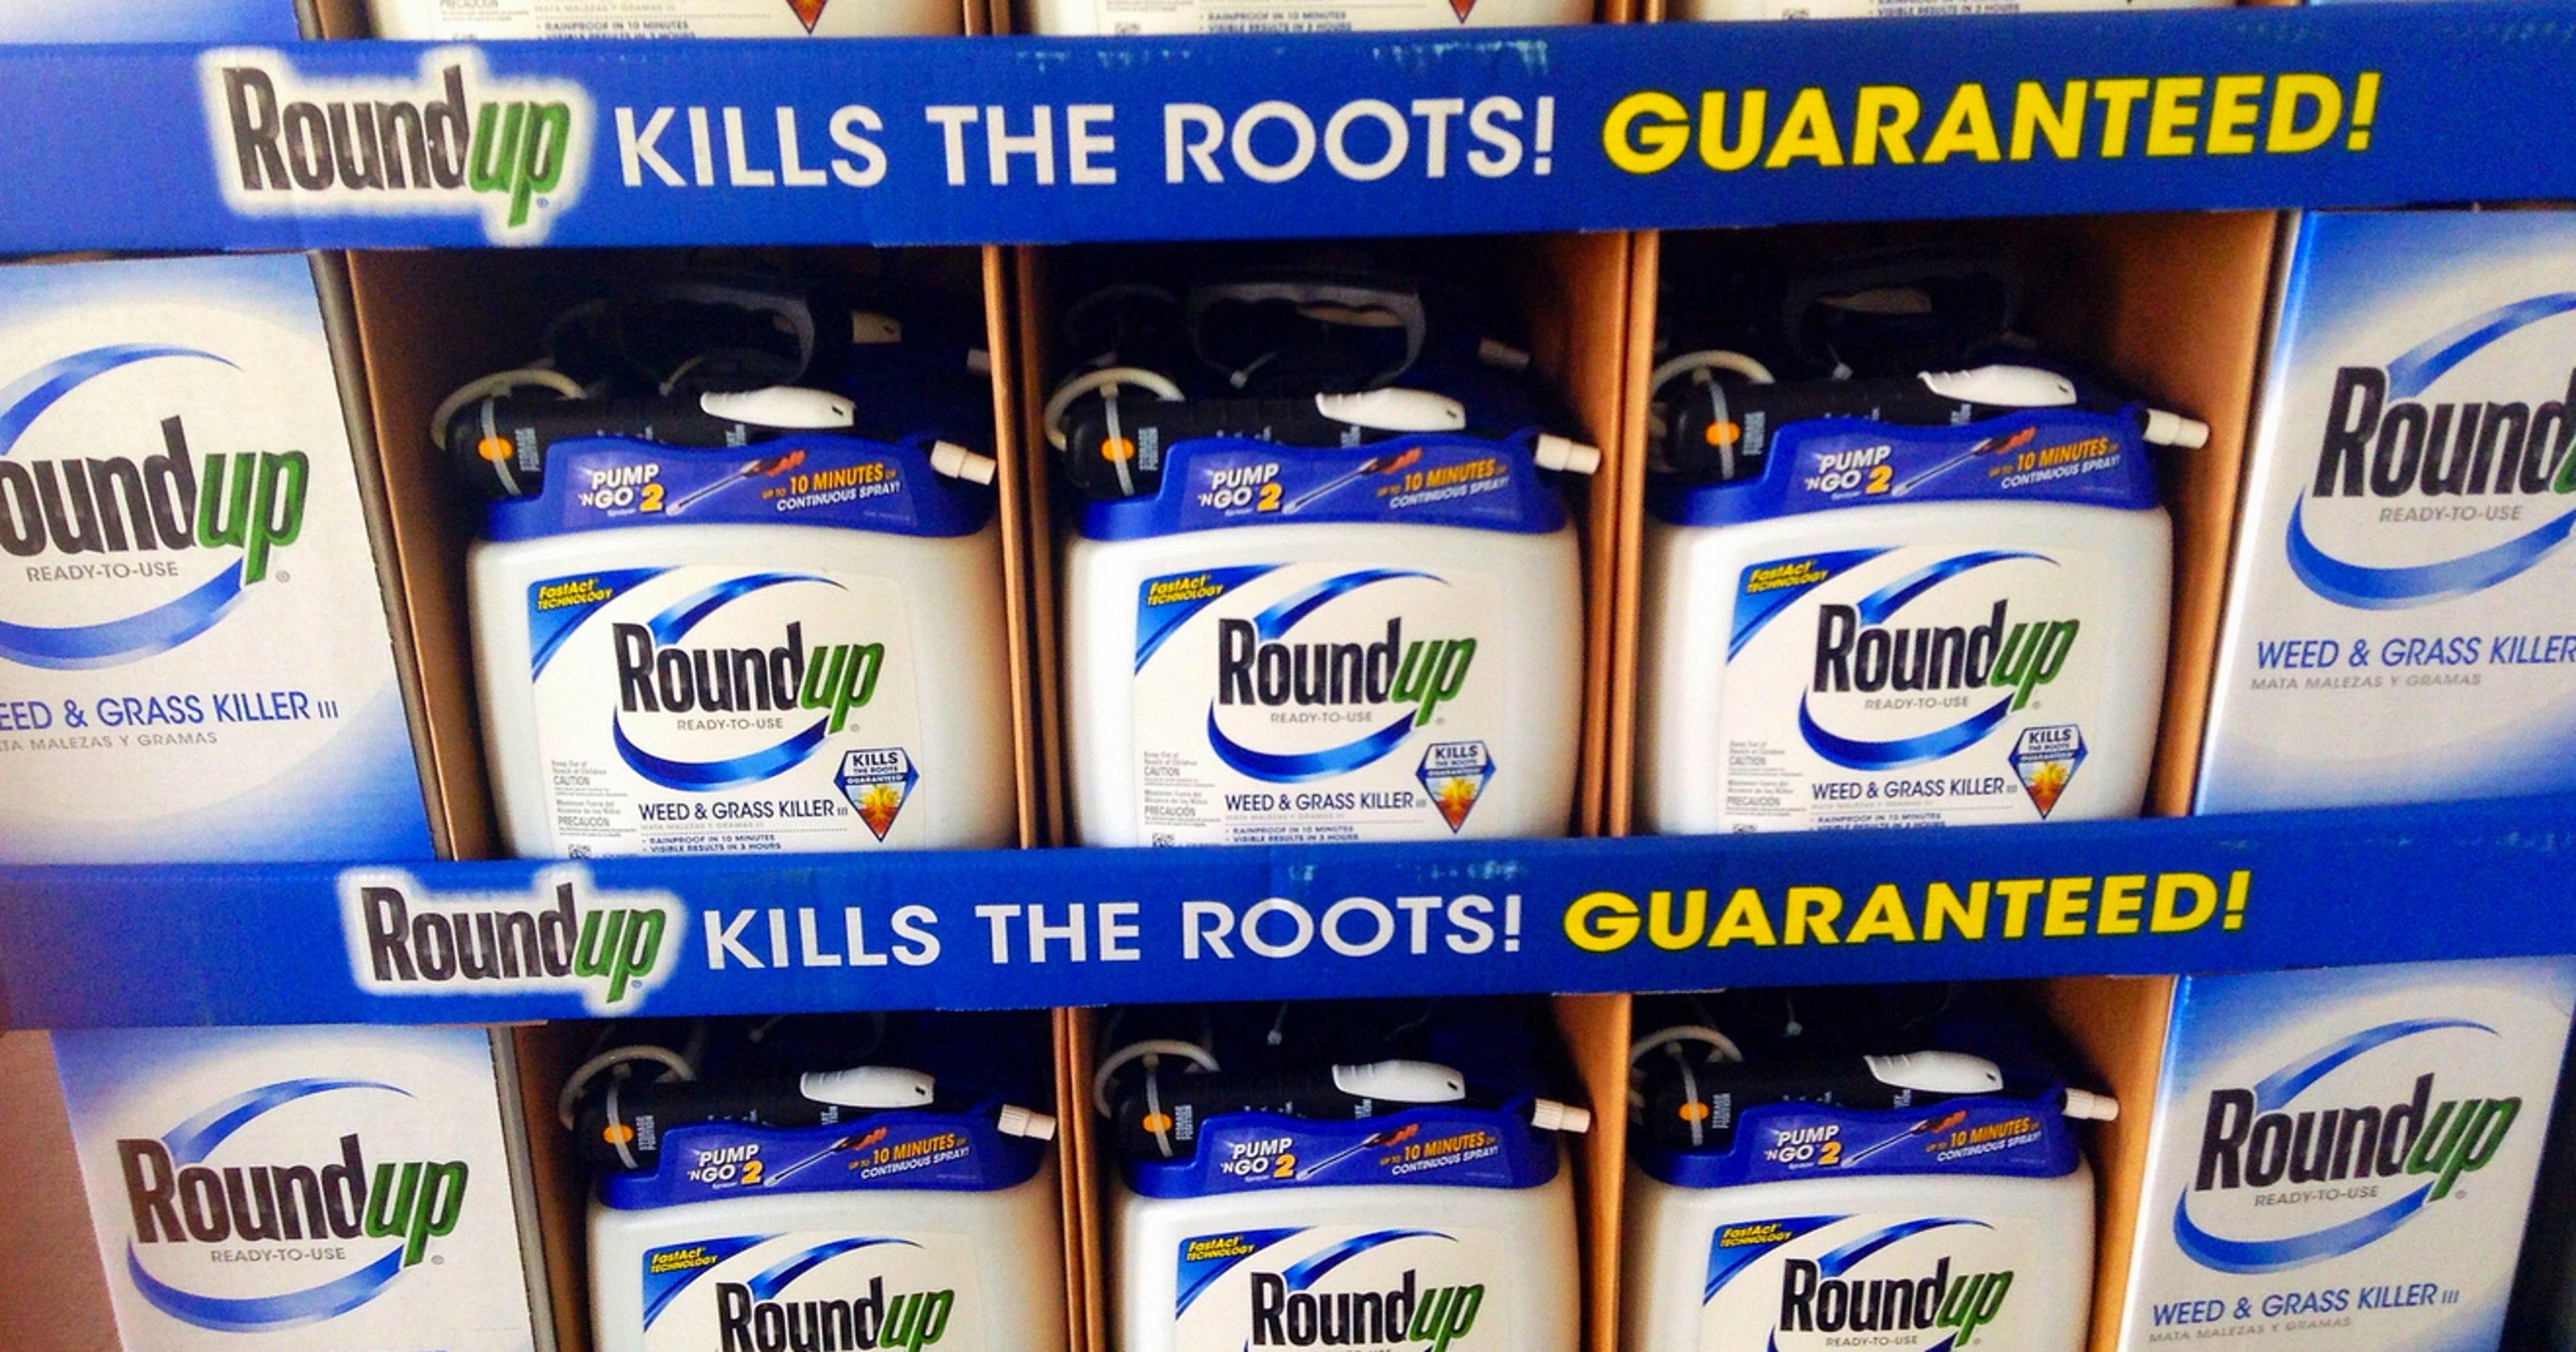 Weed killer in cereal: How dangerous is it?